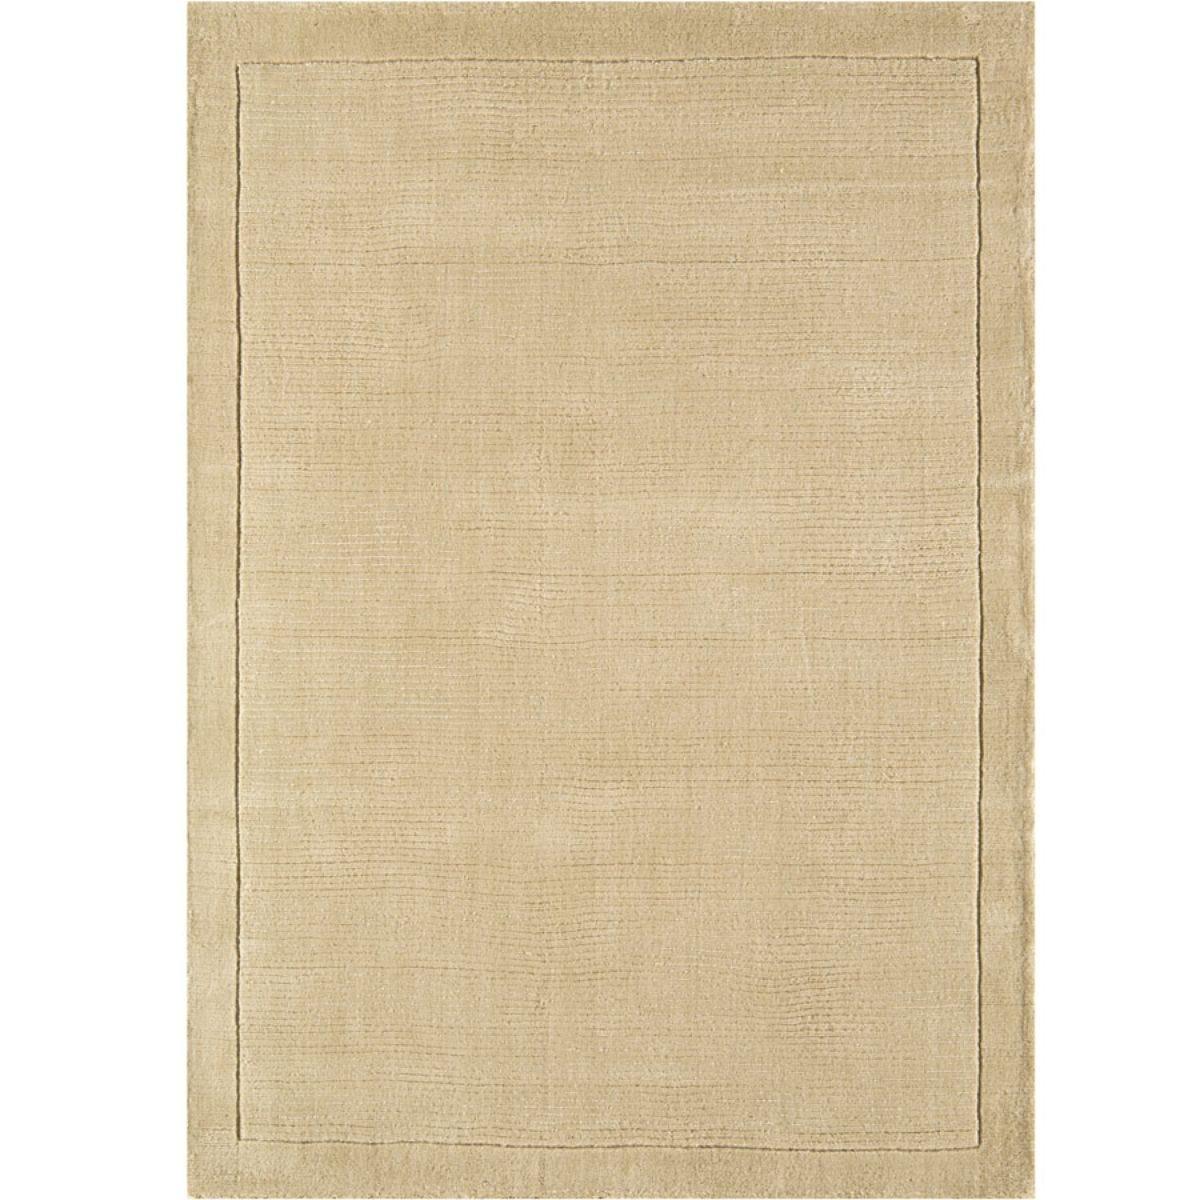 Asiatic York Rug, 160 x 230cm - Beige